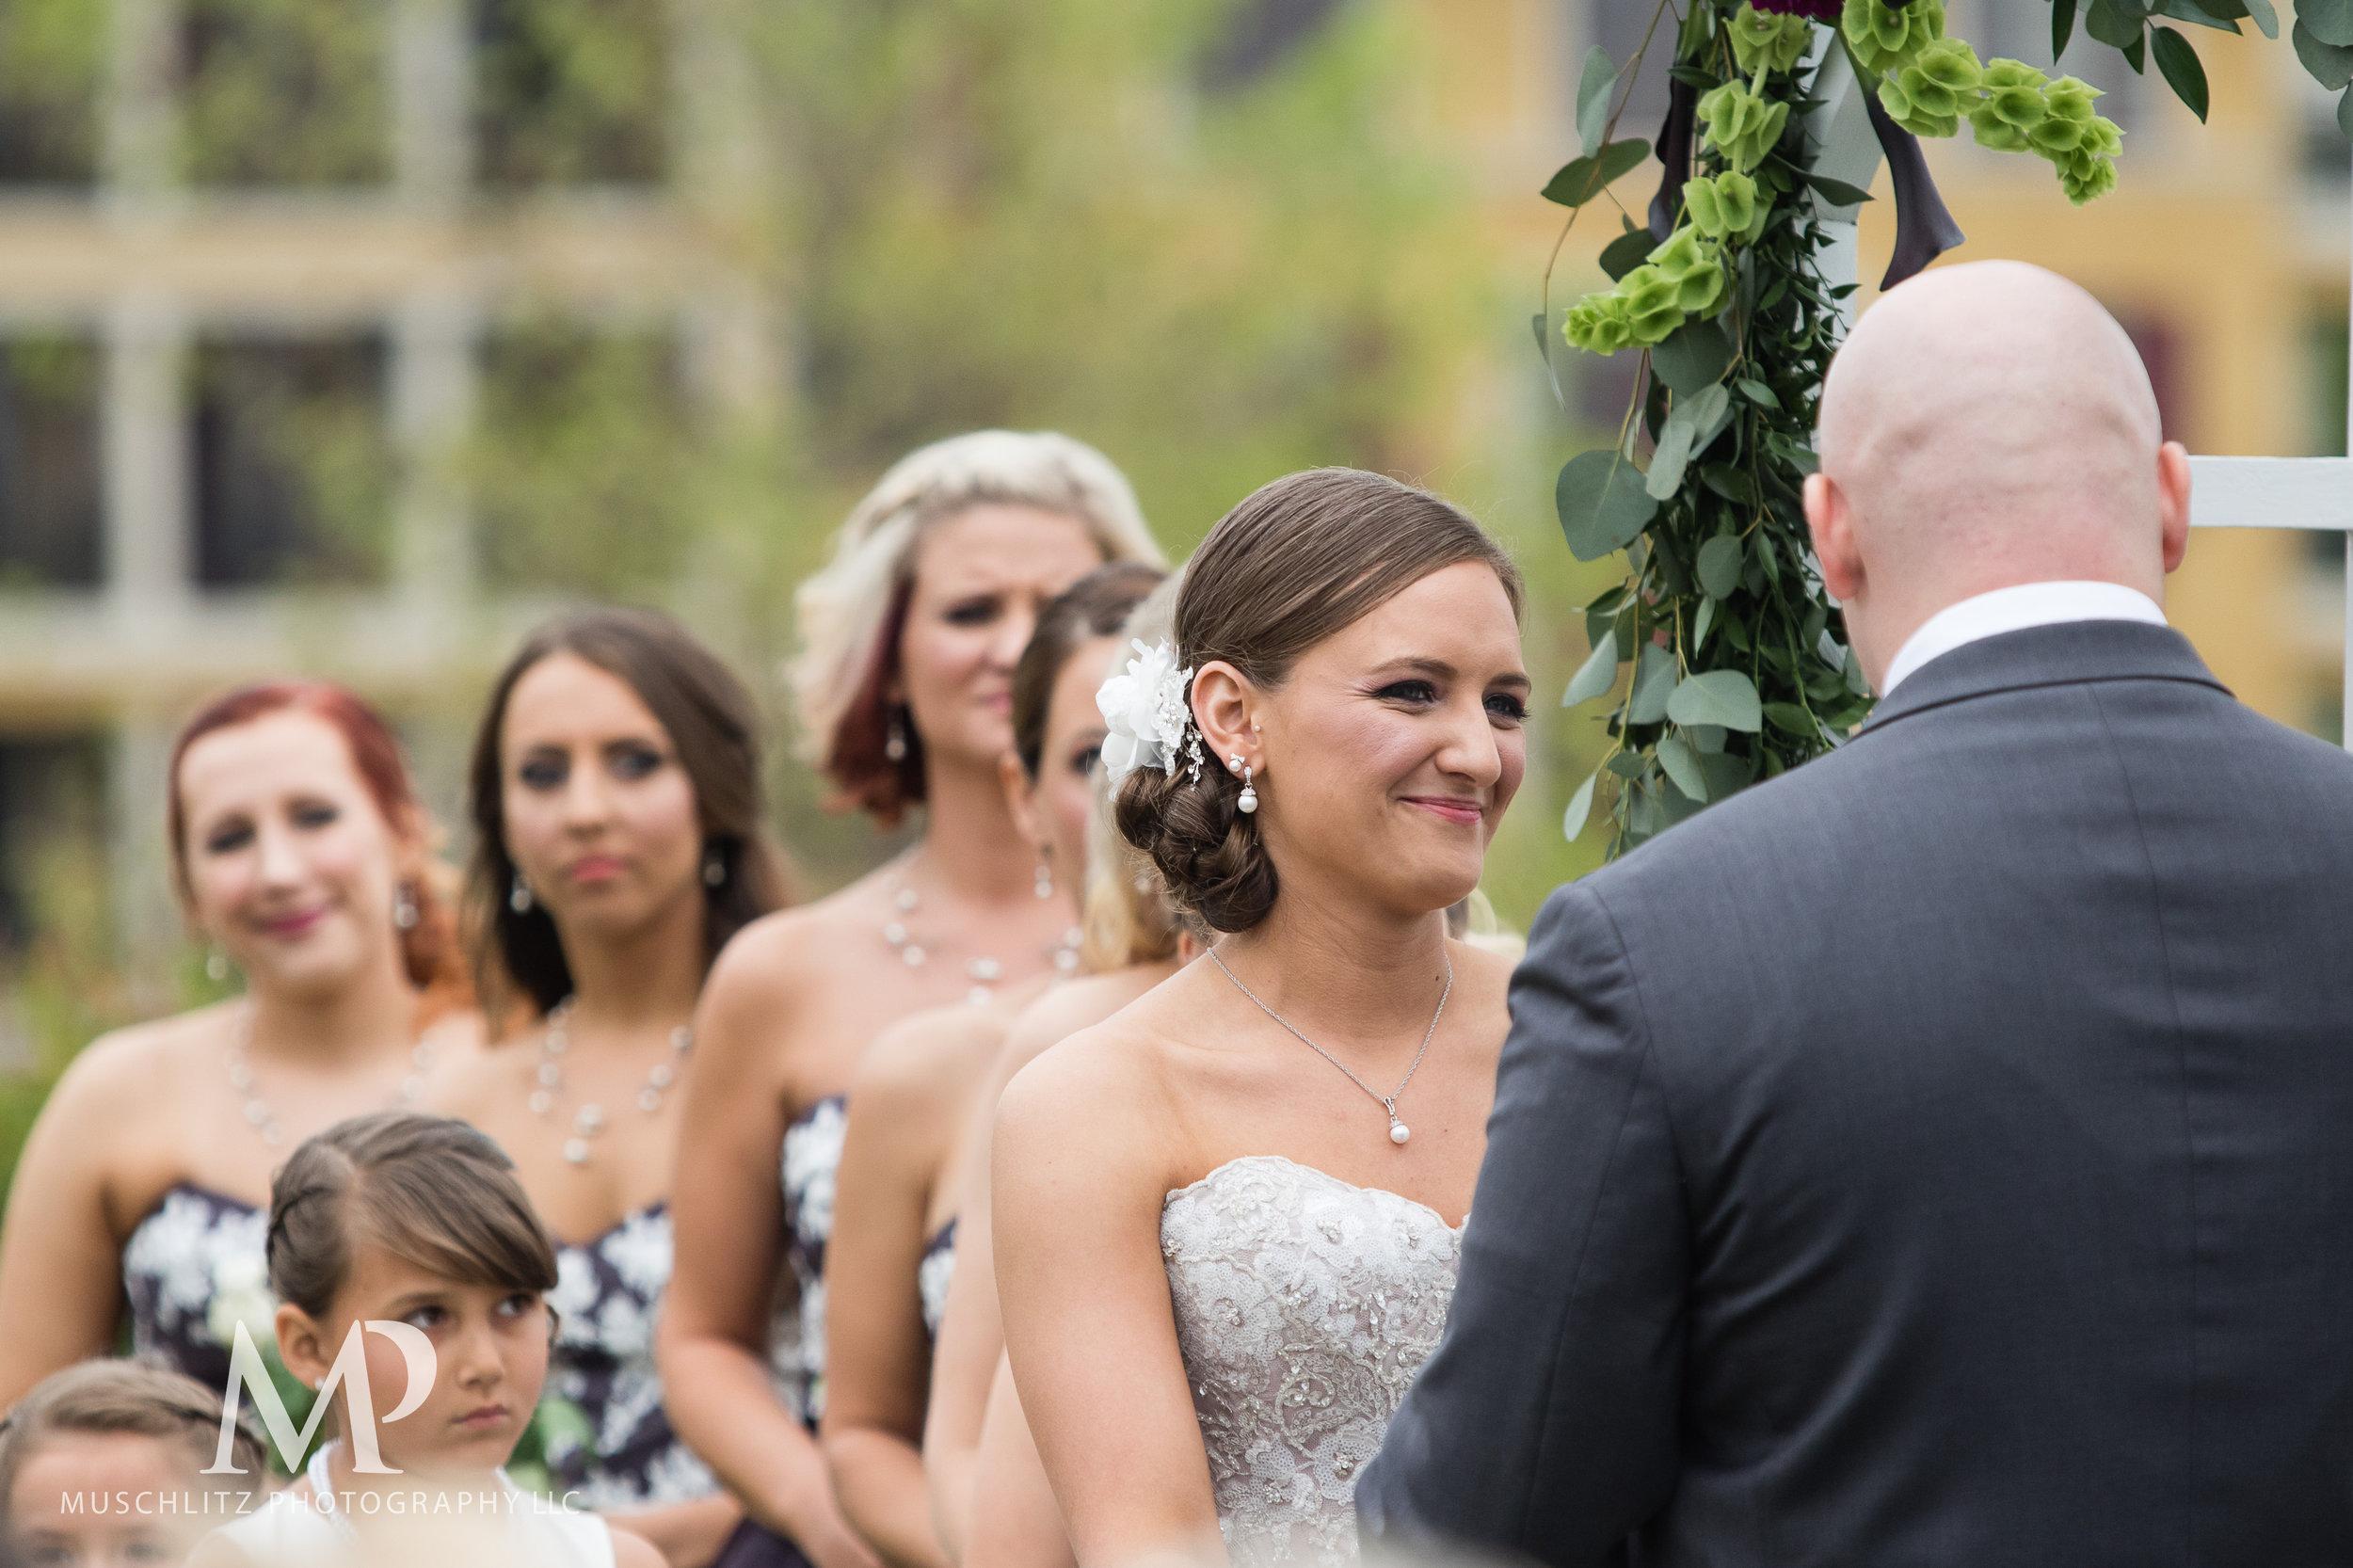 club-at-corazon-wedding-ceremony-reception-columbus-dublin-ohio-ohio-university-theme-033.JPG